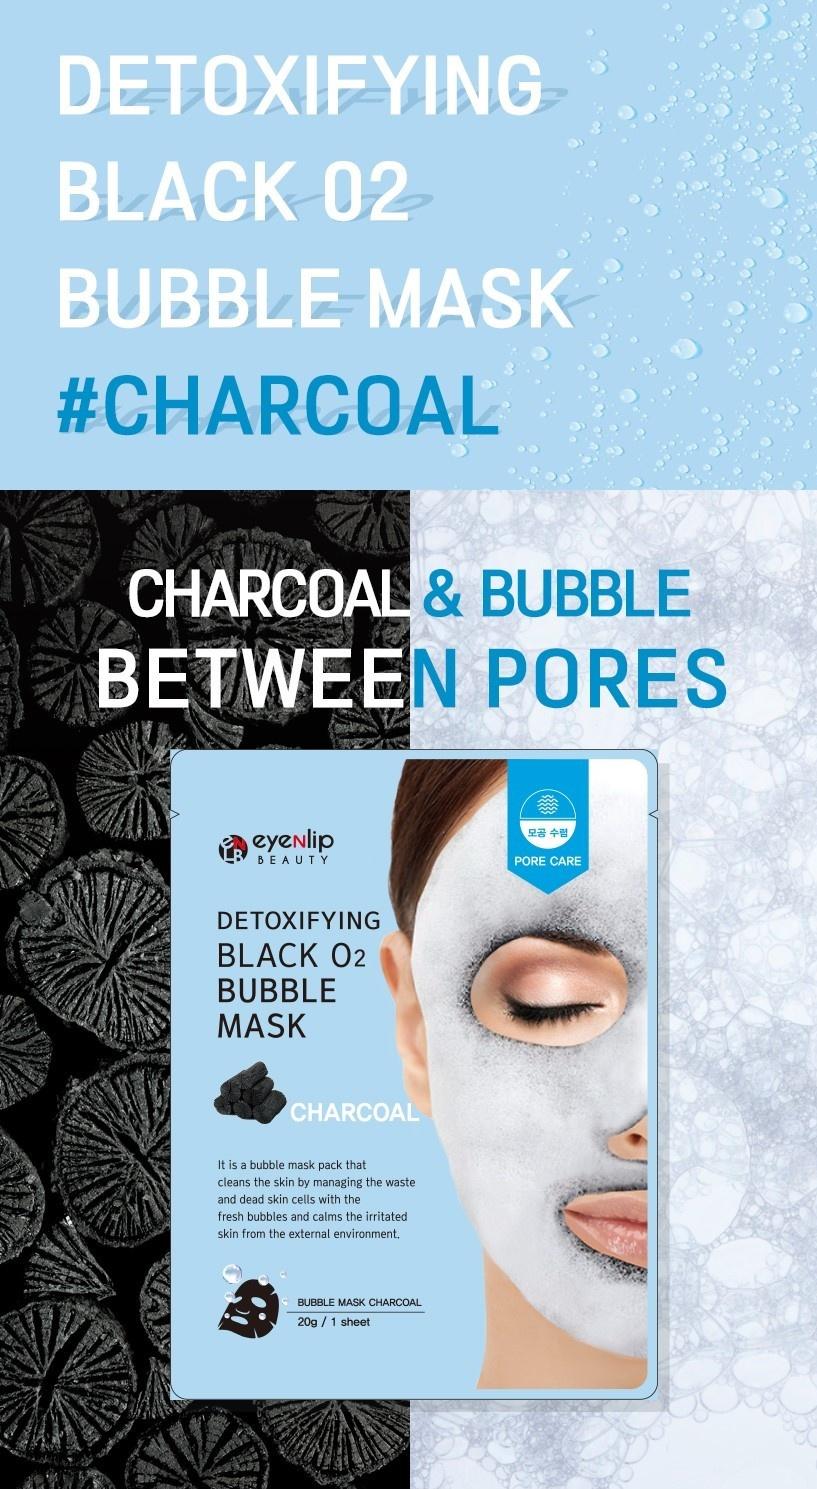 Detoxifying Black O2 Bubble Mask #Charcoal-2